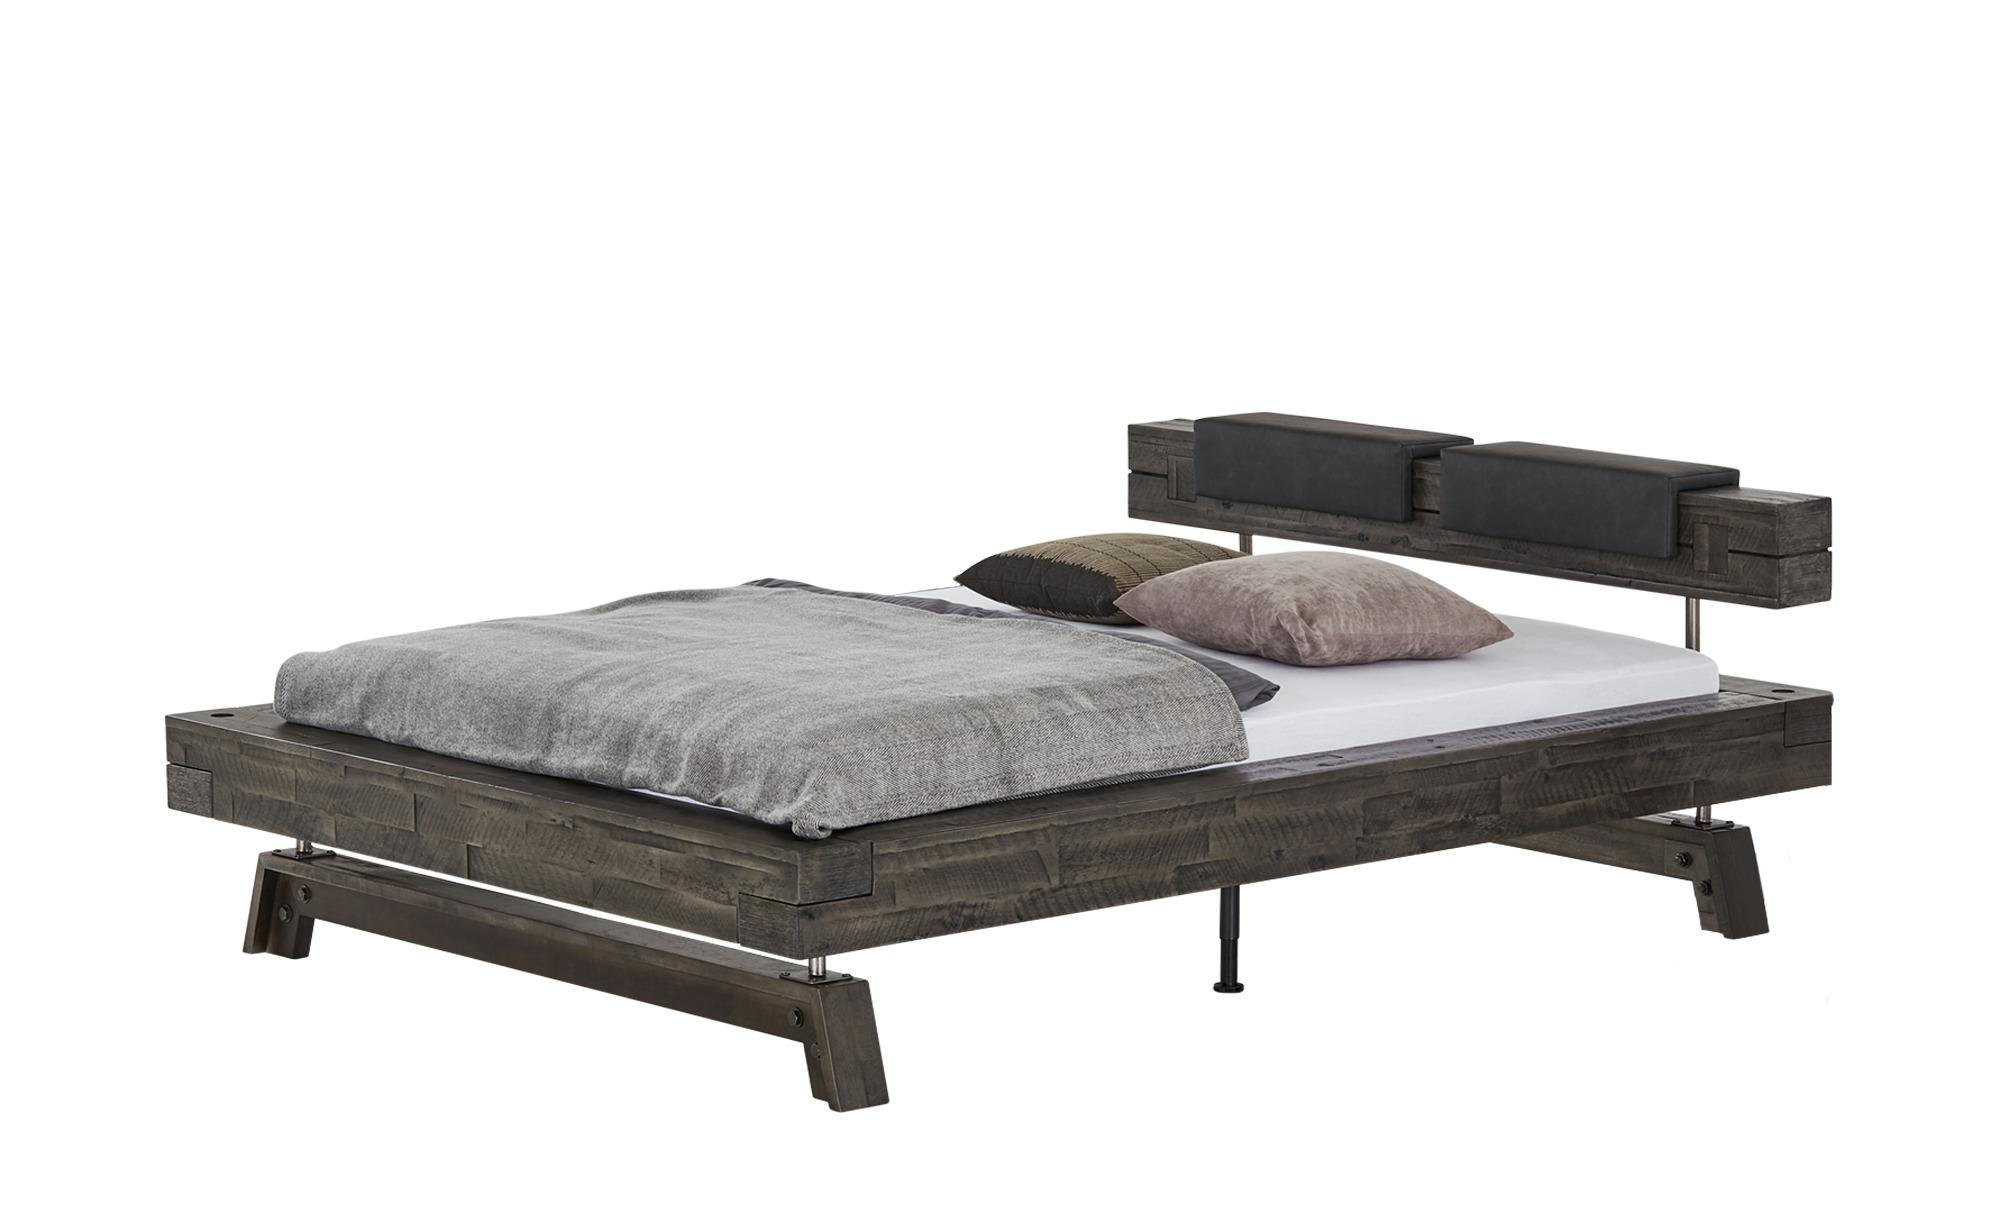 Full Size of Bett 200x220 Bettgestell Inca Cm Mbel Hffner Günstiges Coole Betten Trends Holz 120x200 Mit Bettkasten Rückenlehne Landhaus 160x200 90x200 140x200 Matratze Bett Bett 200x220